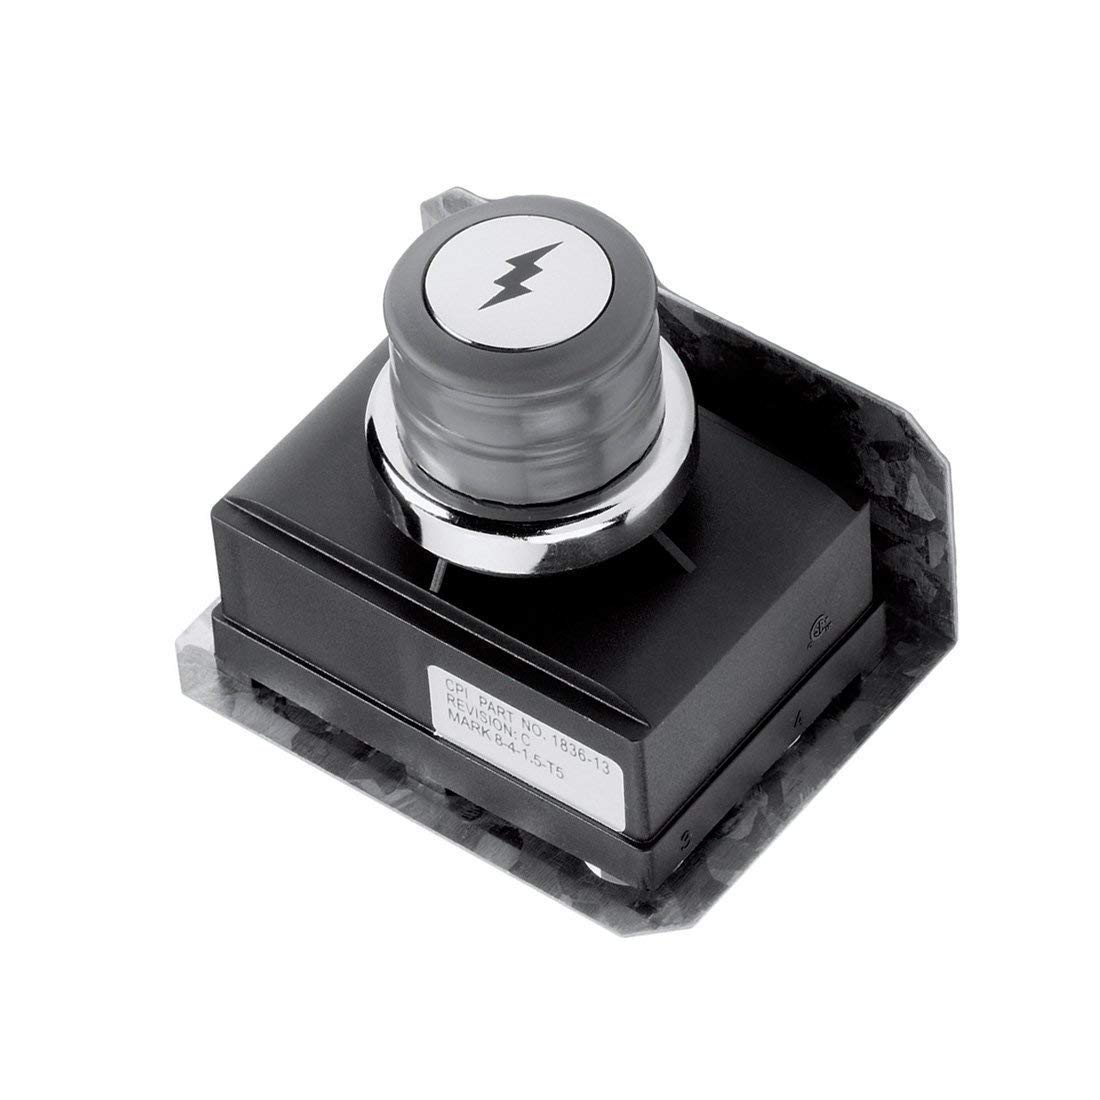 Broilmann Electronic Igniter Kit 4 Outlets Spark Generator Fit Select Weber Grills: Genesis E-310 2011-2013, Weber 6512001, 6519009, Weber 7629 by Broilmann